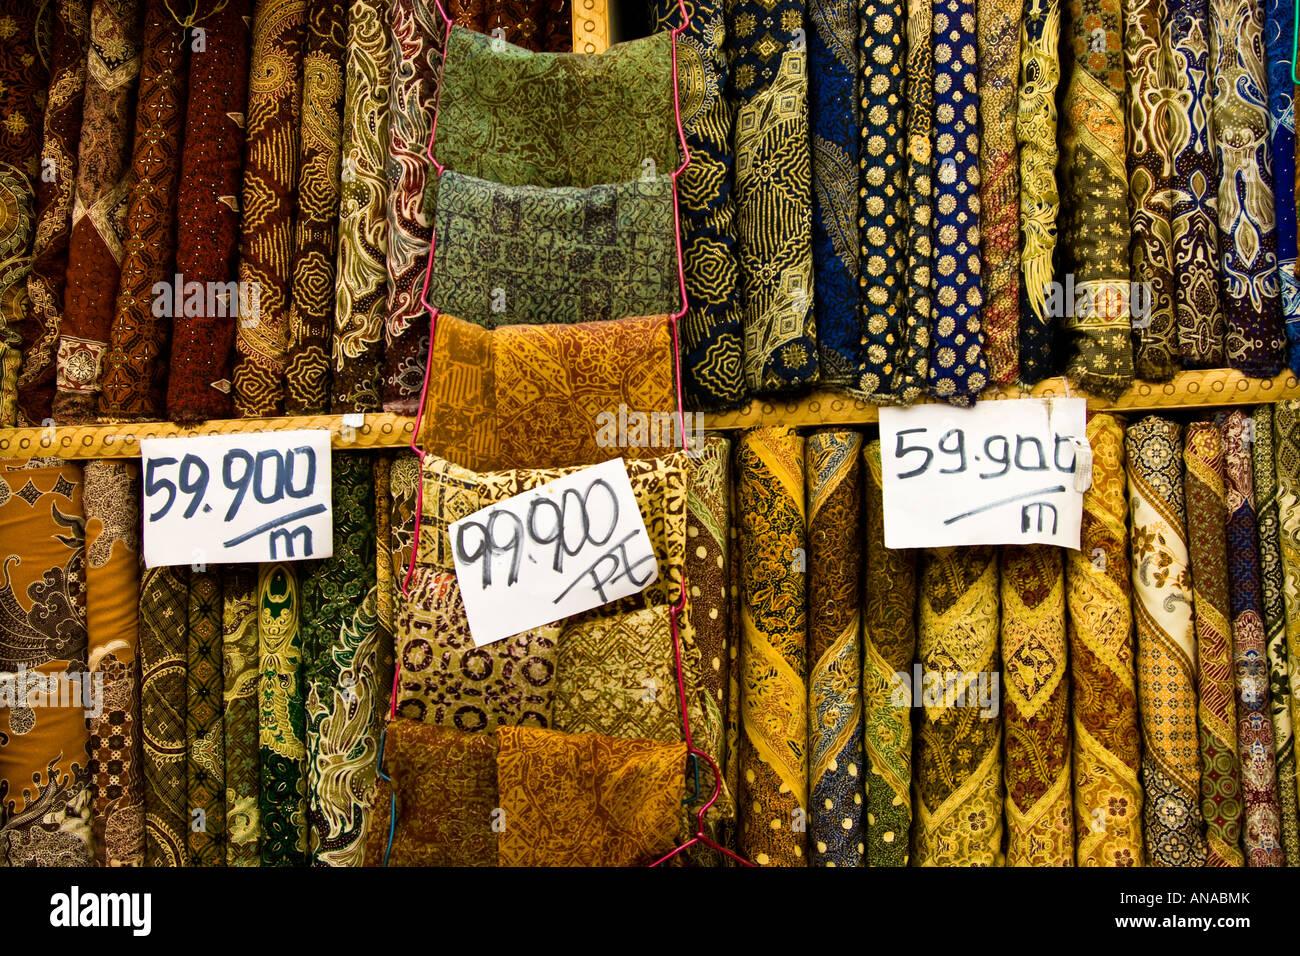 Indonesian Abstrak Batik: Batik Java Indonesia Indonesian Stock Photos & Batik Java